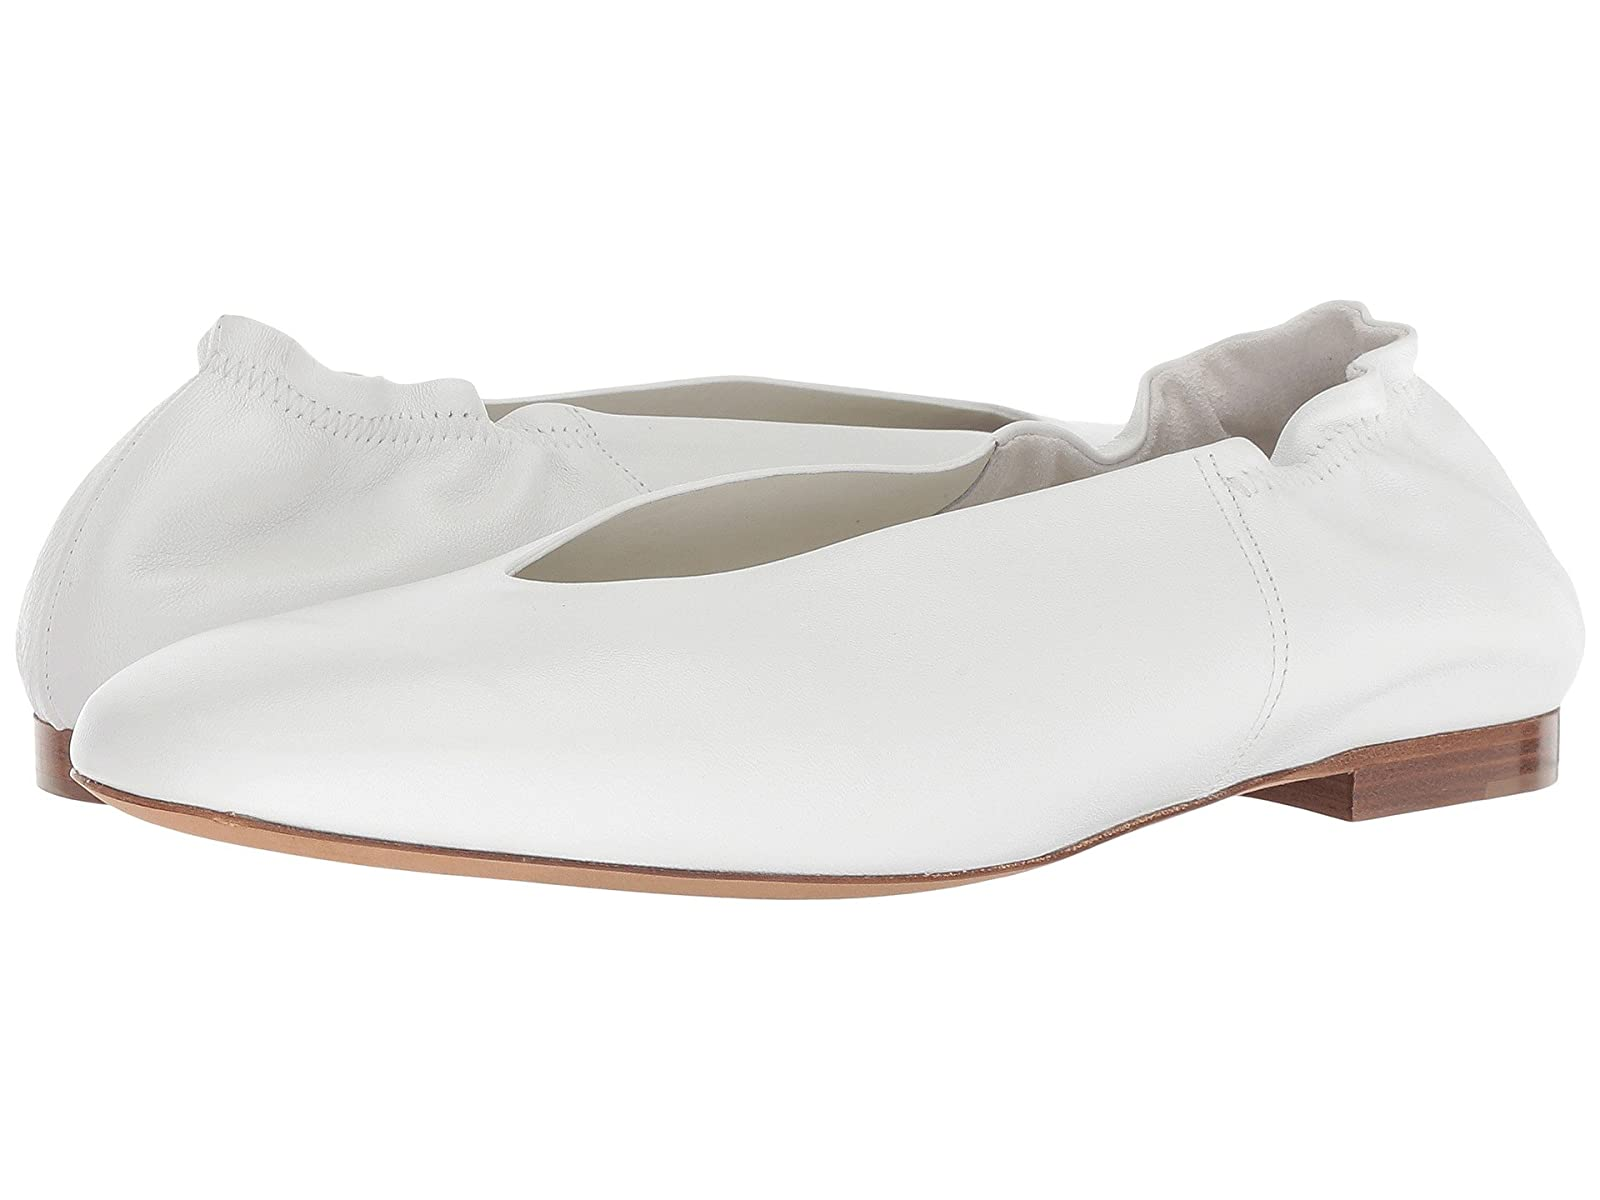 Vince LorelleCheap and distinctive eye-catching shoes